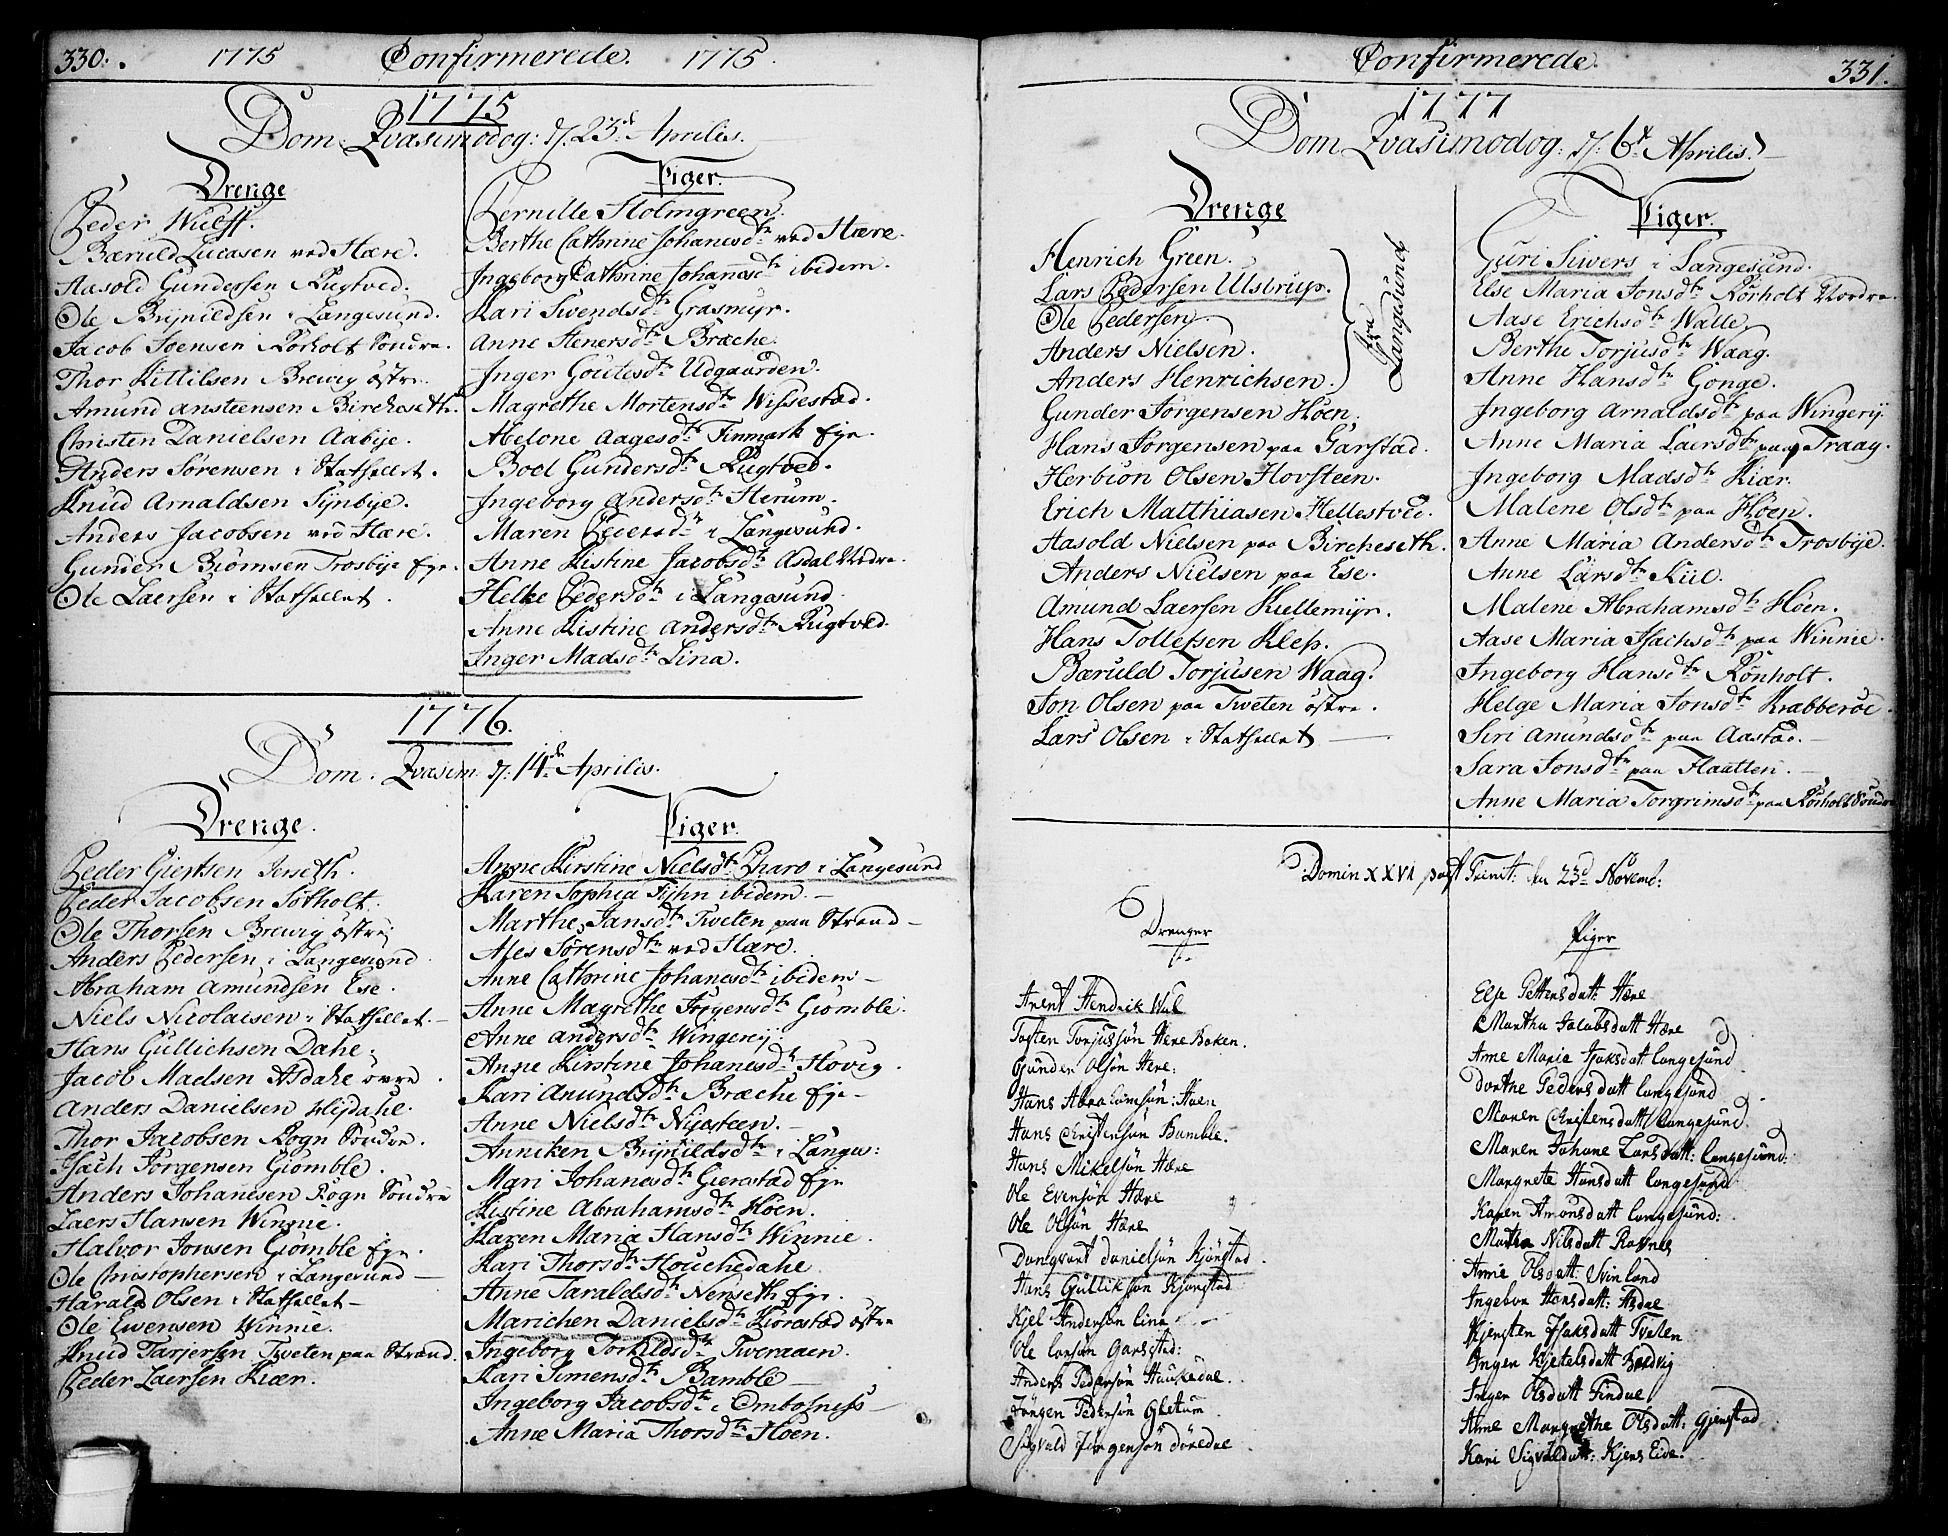 SAKO, Bamble kirkebøker, F/Fa/L0002: Ministerialbok nr. I 2, 1775-1814, s. 330-331